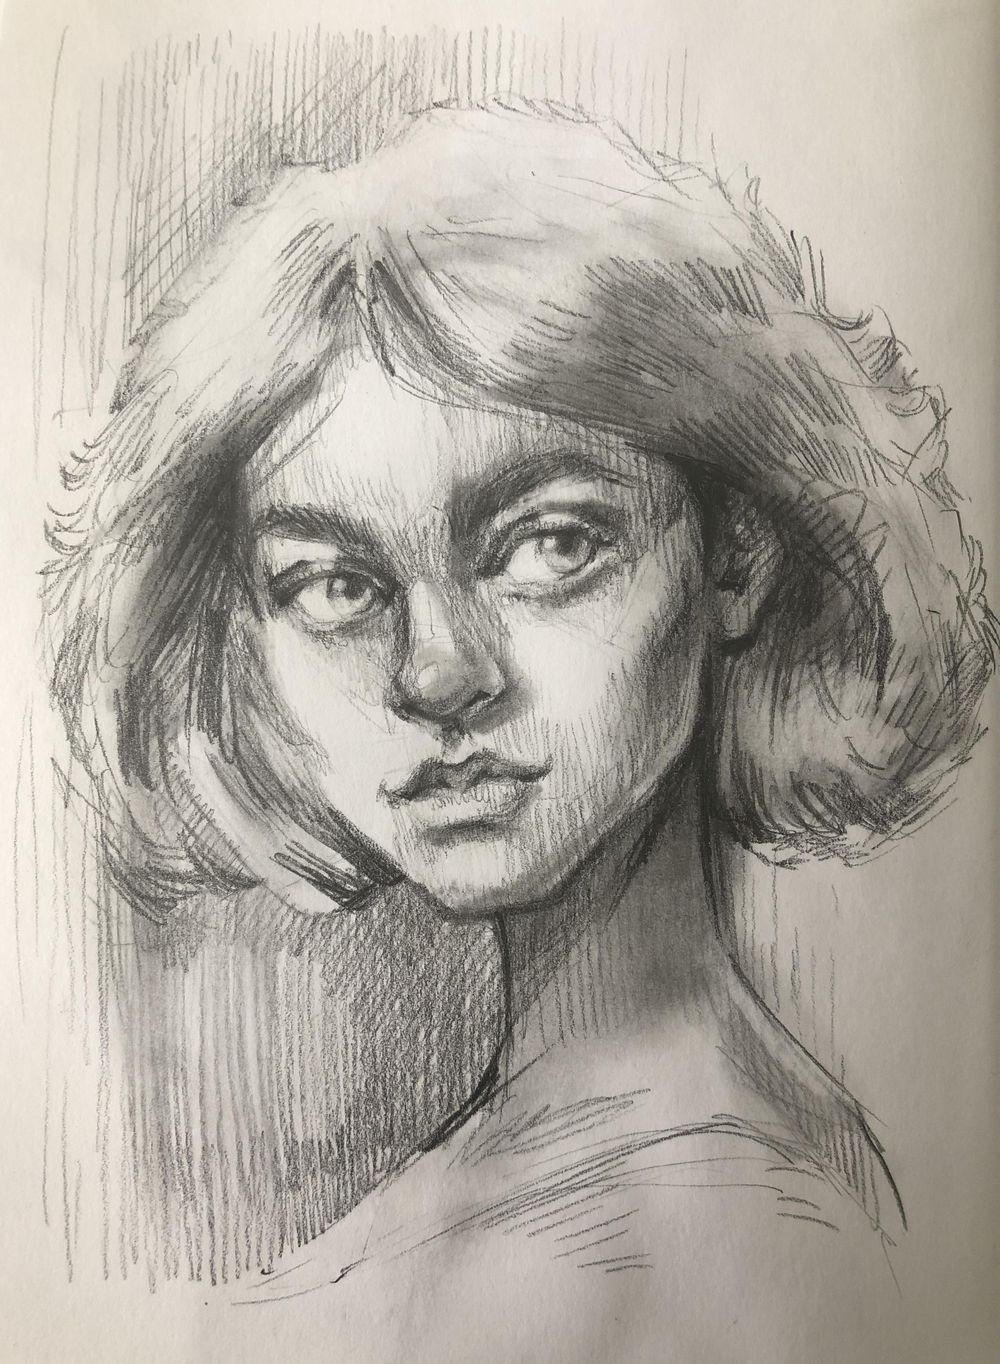 I love Portraiture! - image 1 - student project